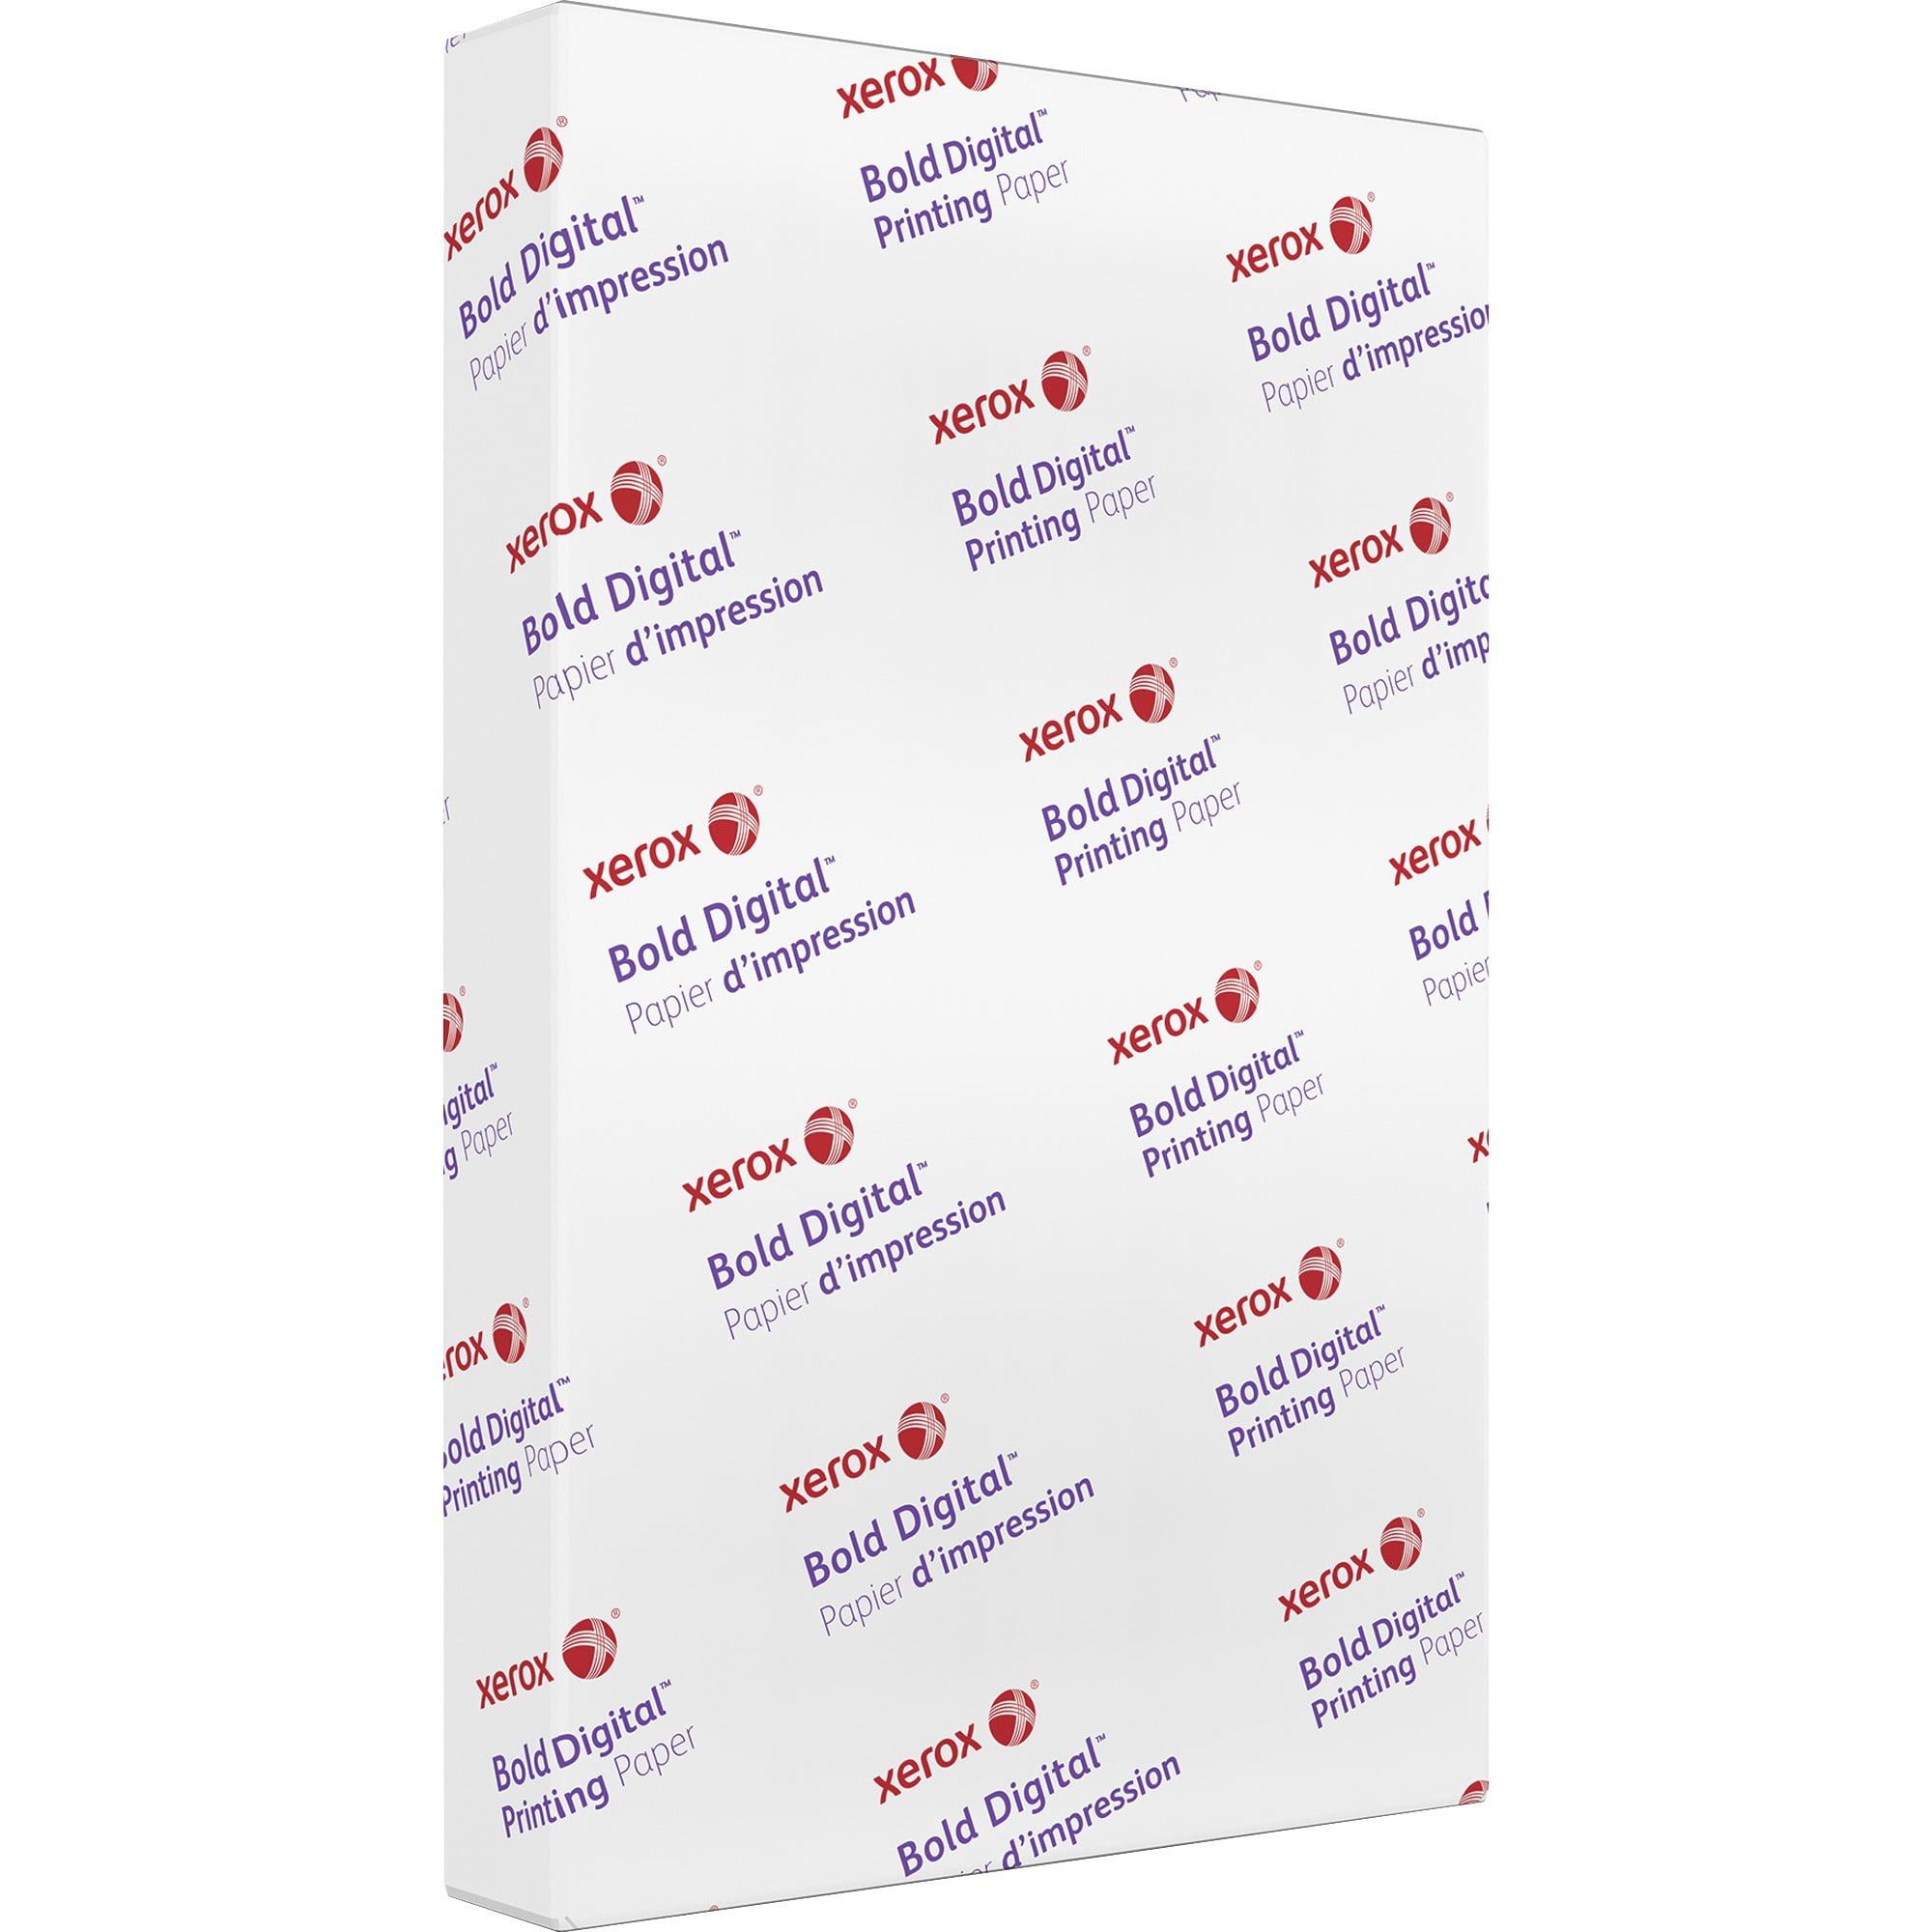 Xerox, XER3R11543, Bold Digital Printing Paper, 500 / Ream, White